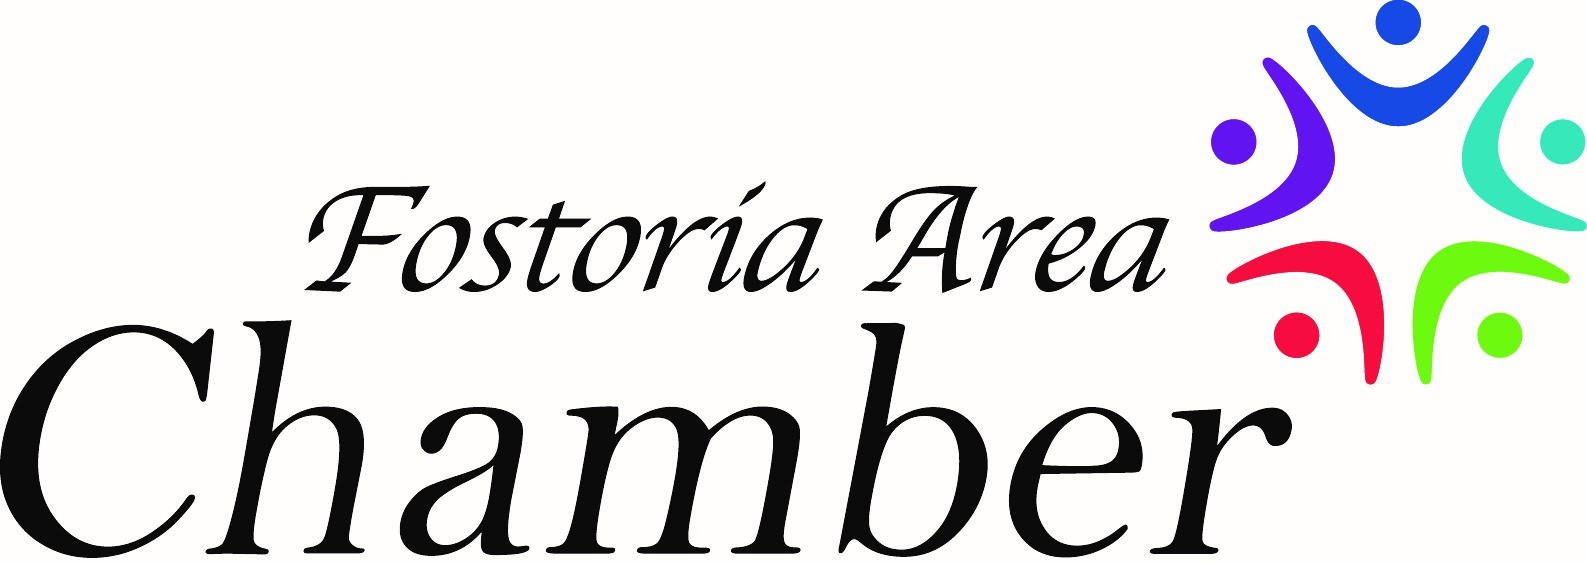 Fostoria Area Chamber of Commerce